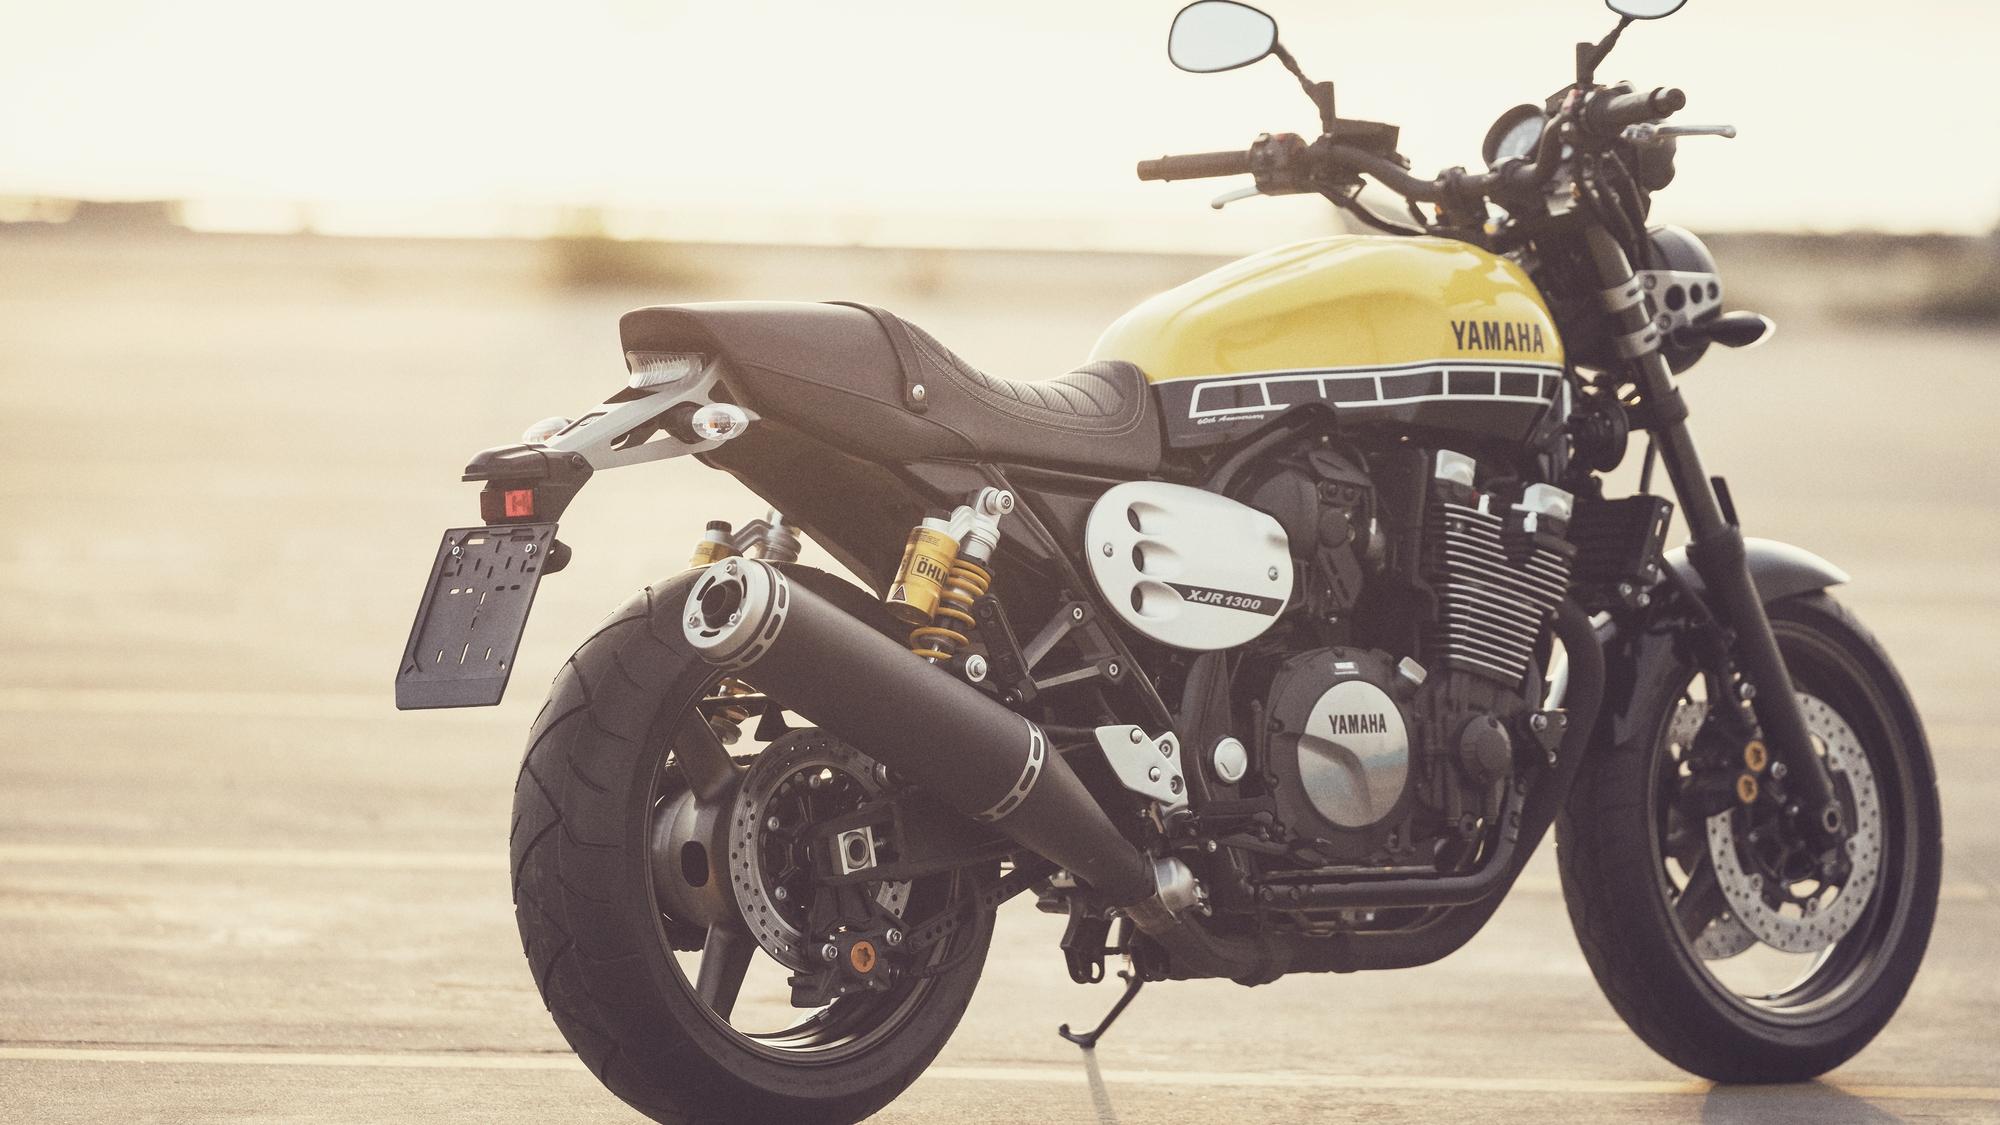 xjr1300 motorcycles yamaha motor. Black Bedroom Furniture Sets. Home Design Ideas